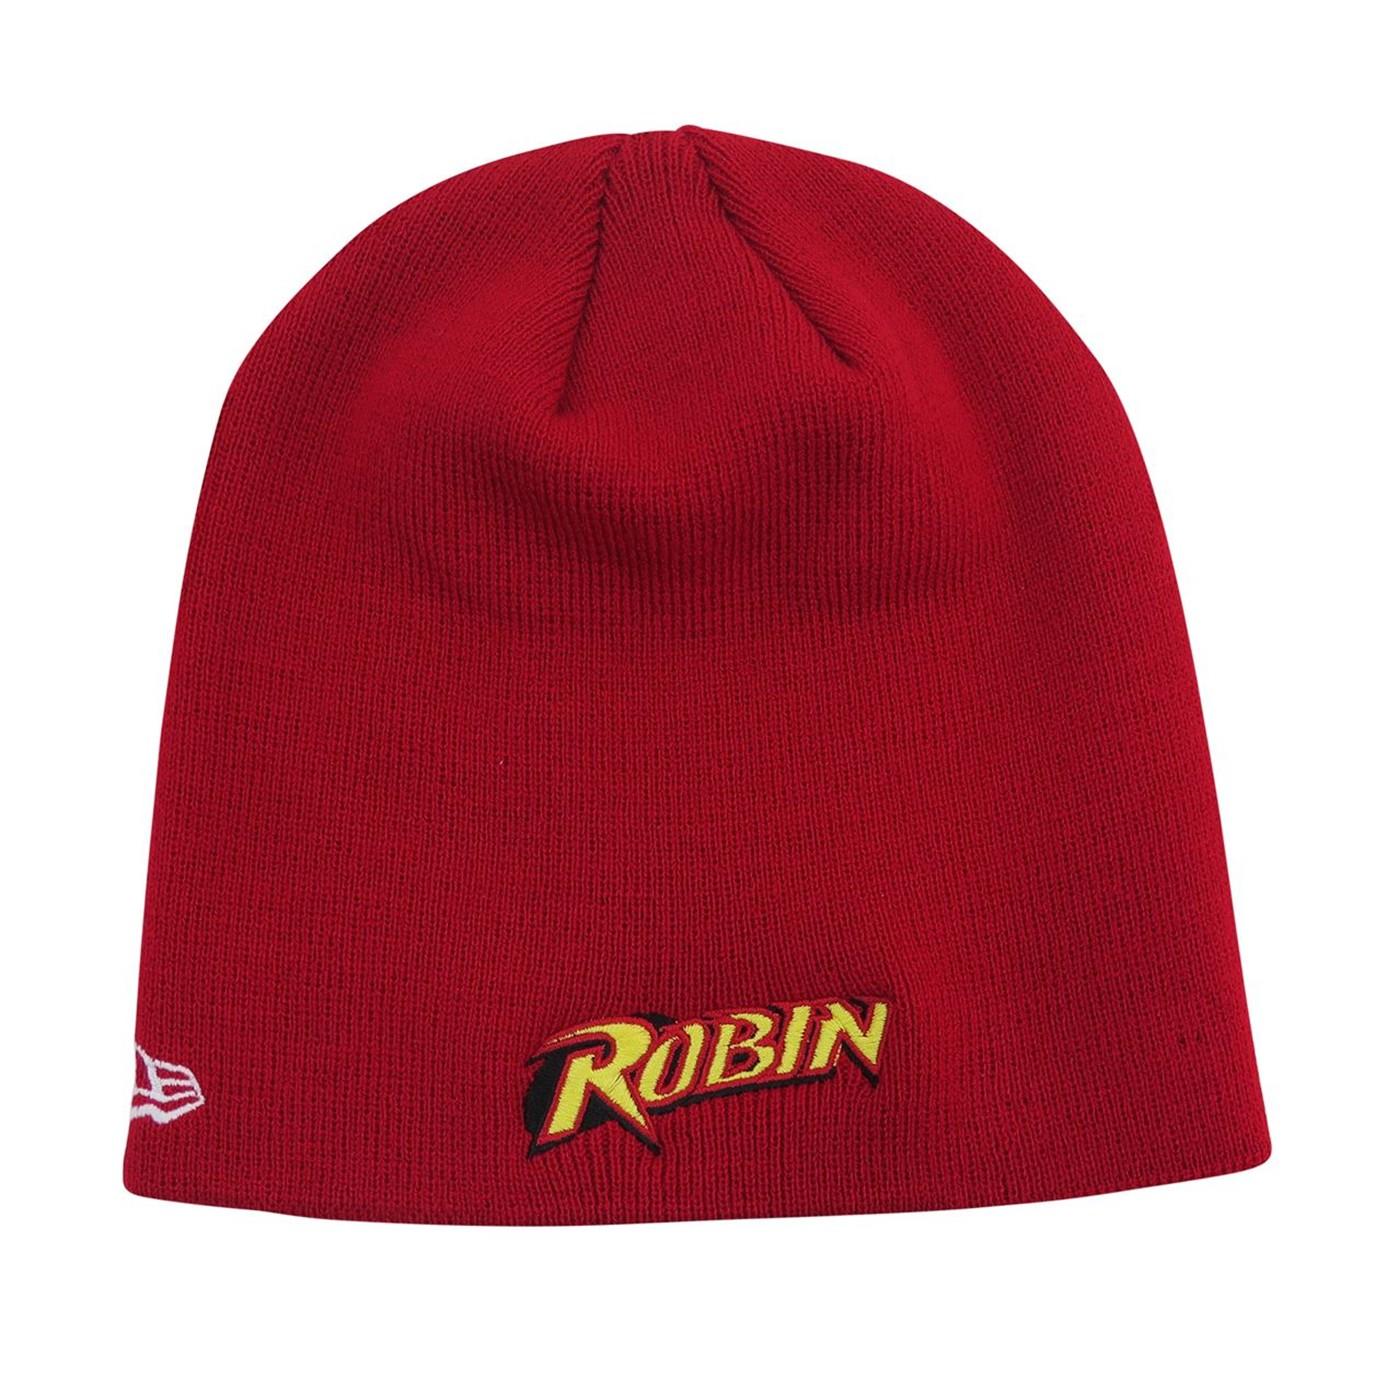 Robin Symbol Red New Era Beanie